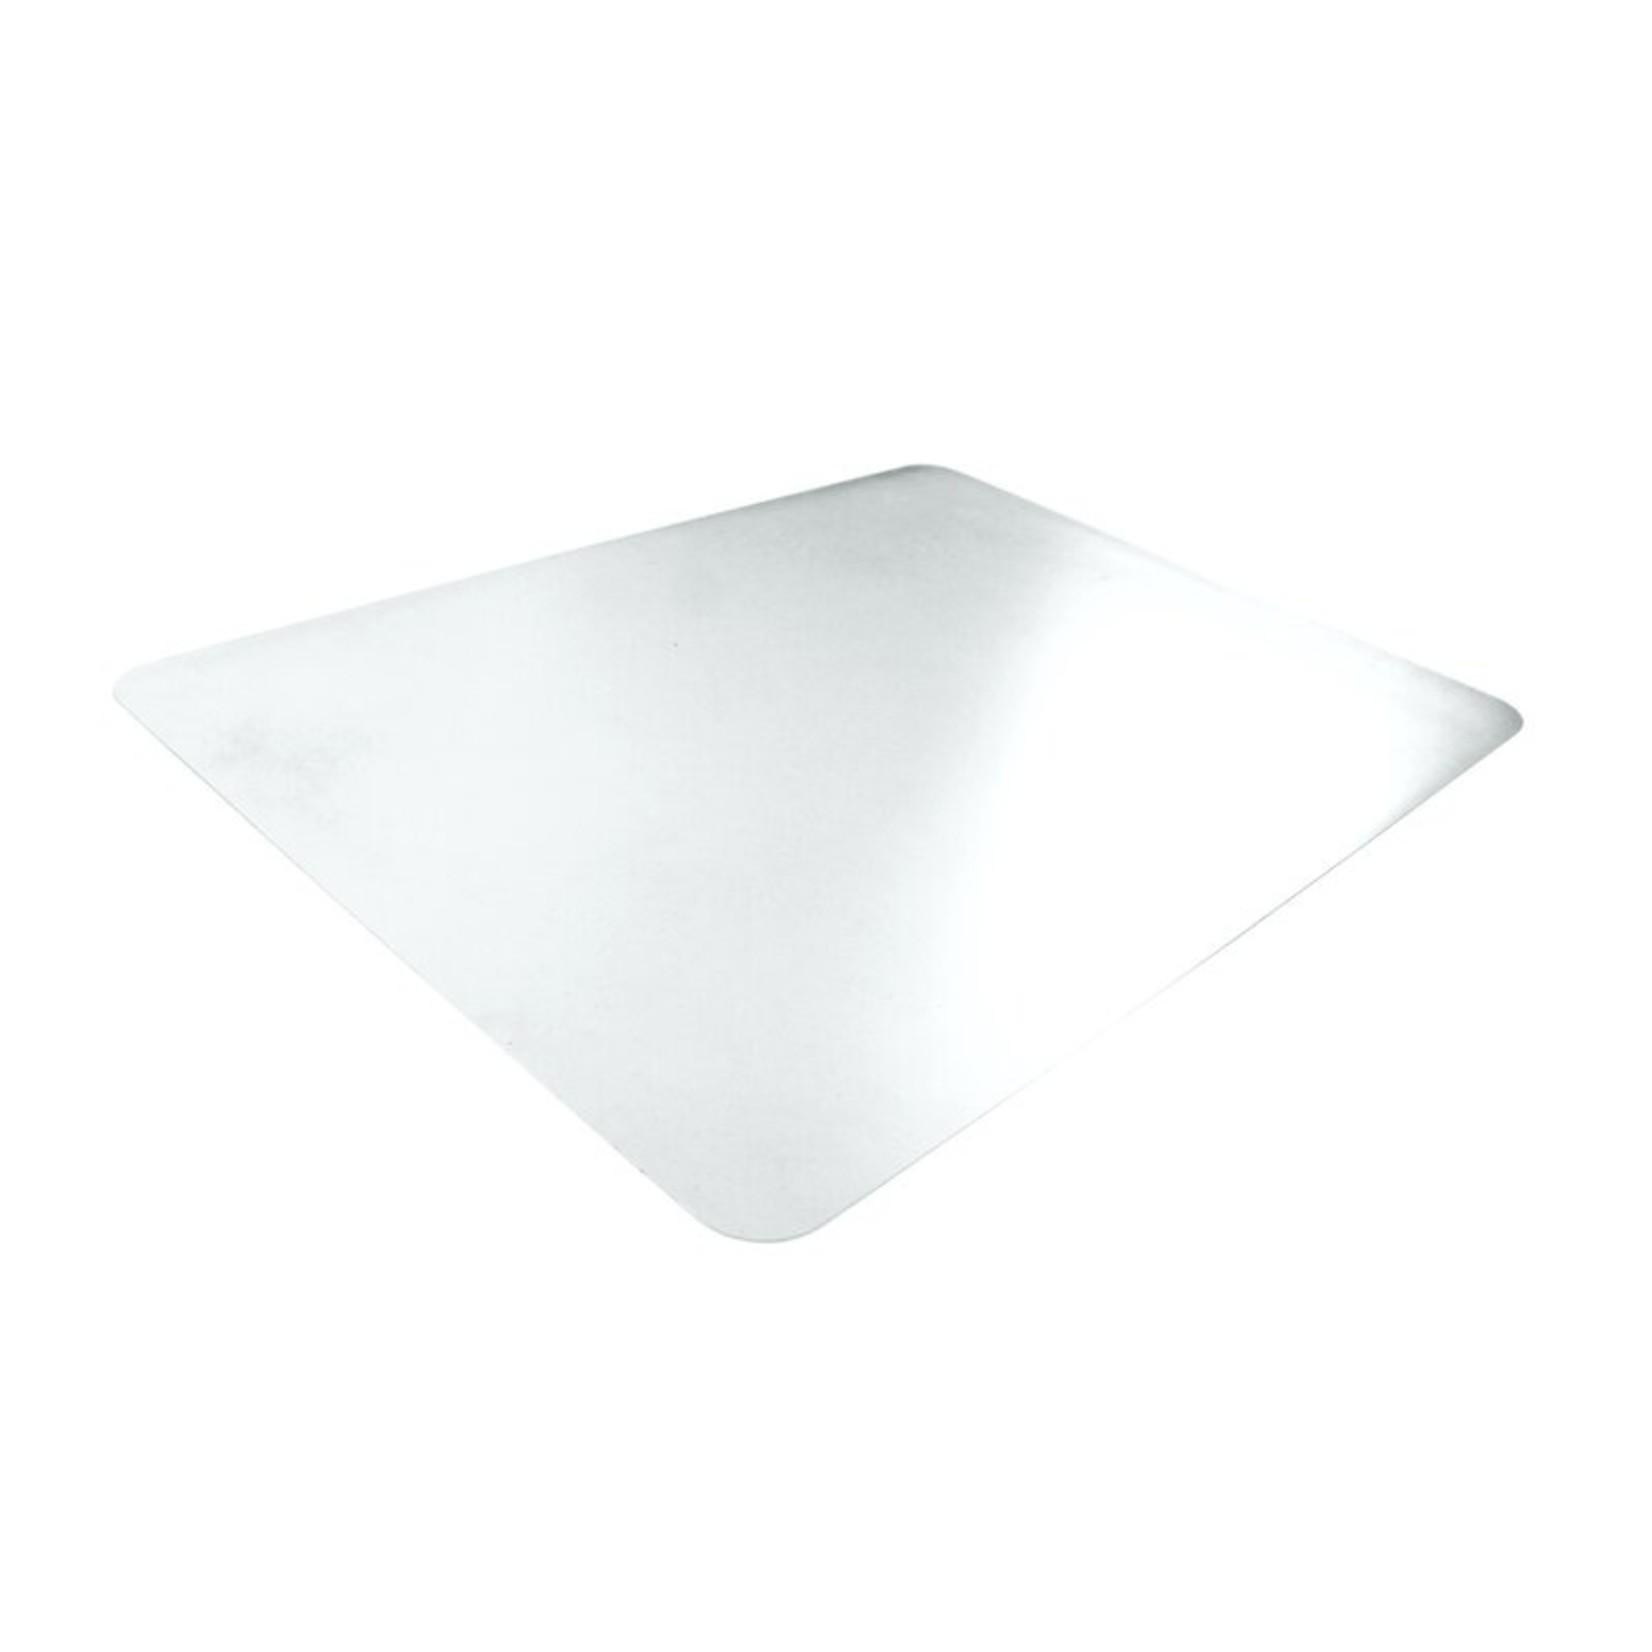 "*48"" x 32"" - Hometex Anti-Microbial Vinyl Straight Edge Table Protector"